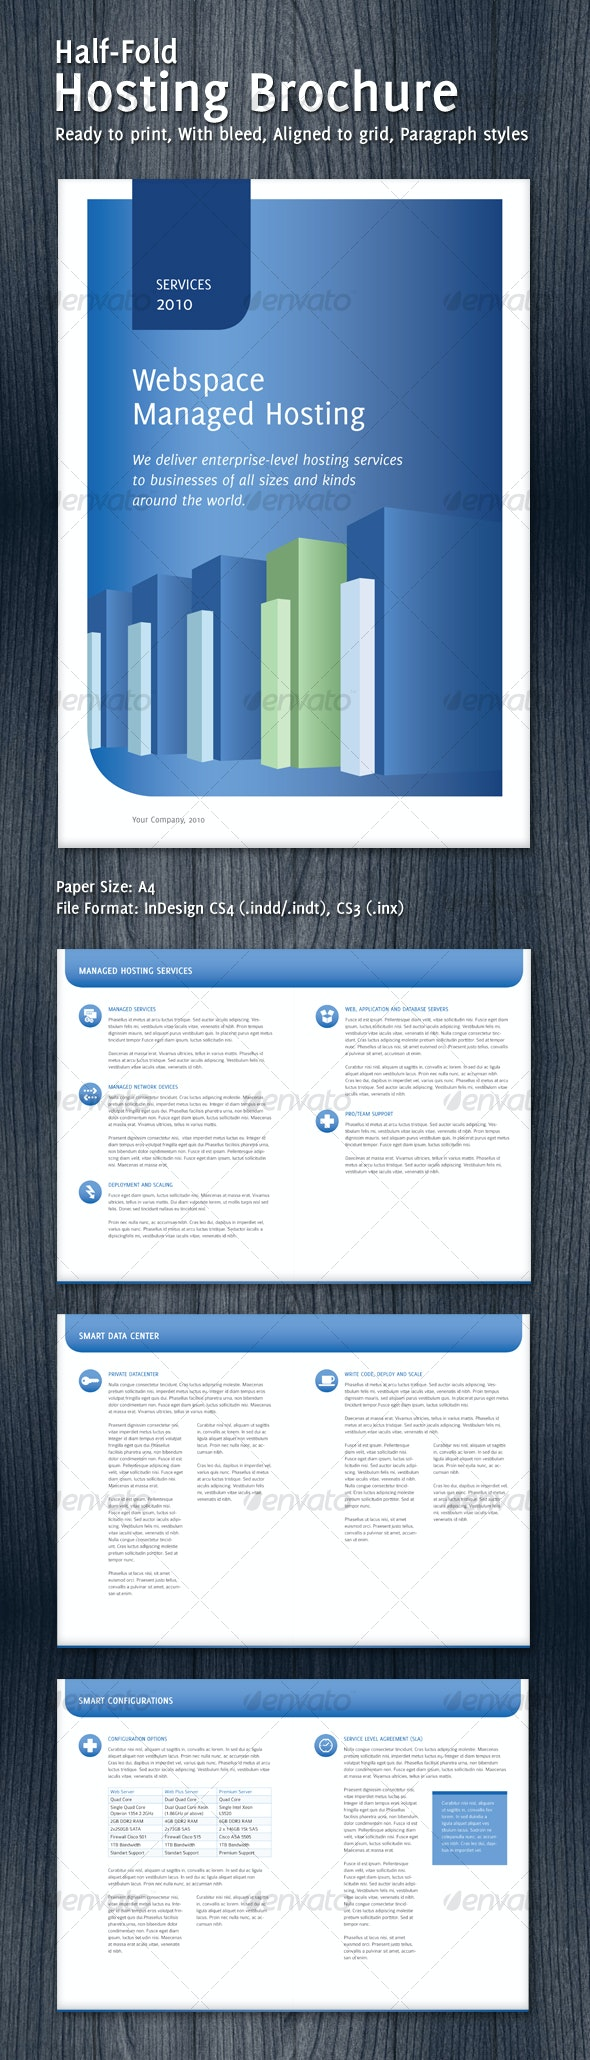 Half-Fold Hosting Brochure - Corporate Brochures